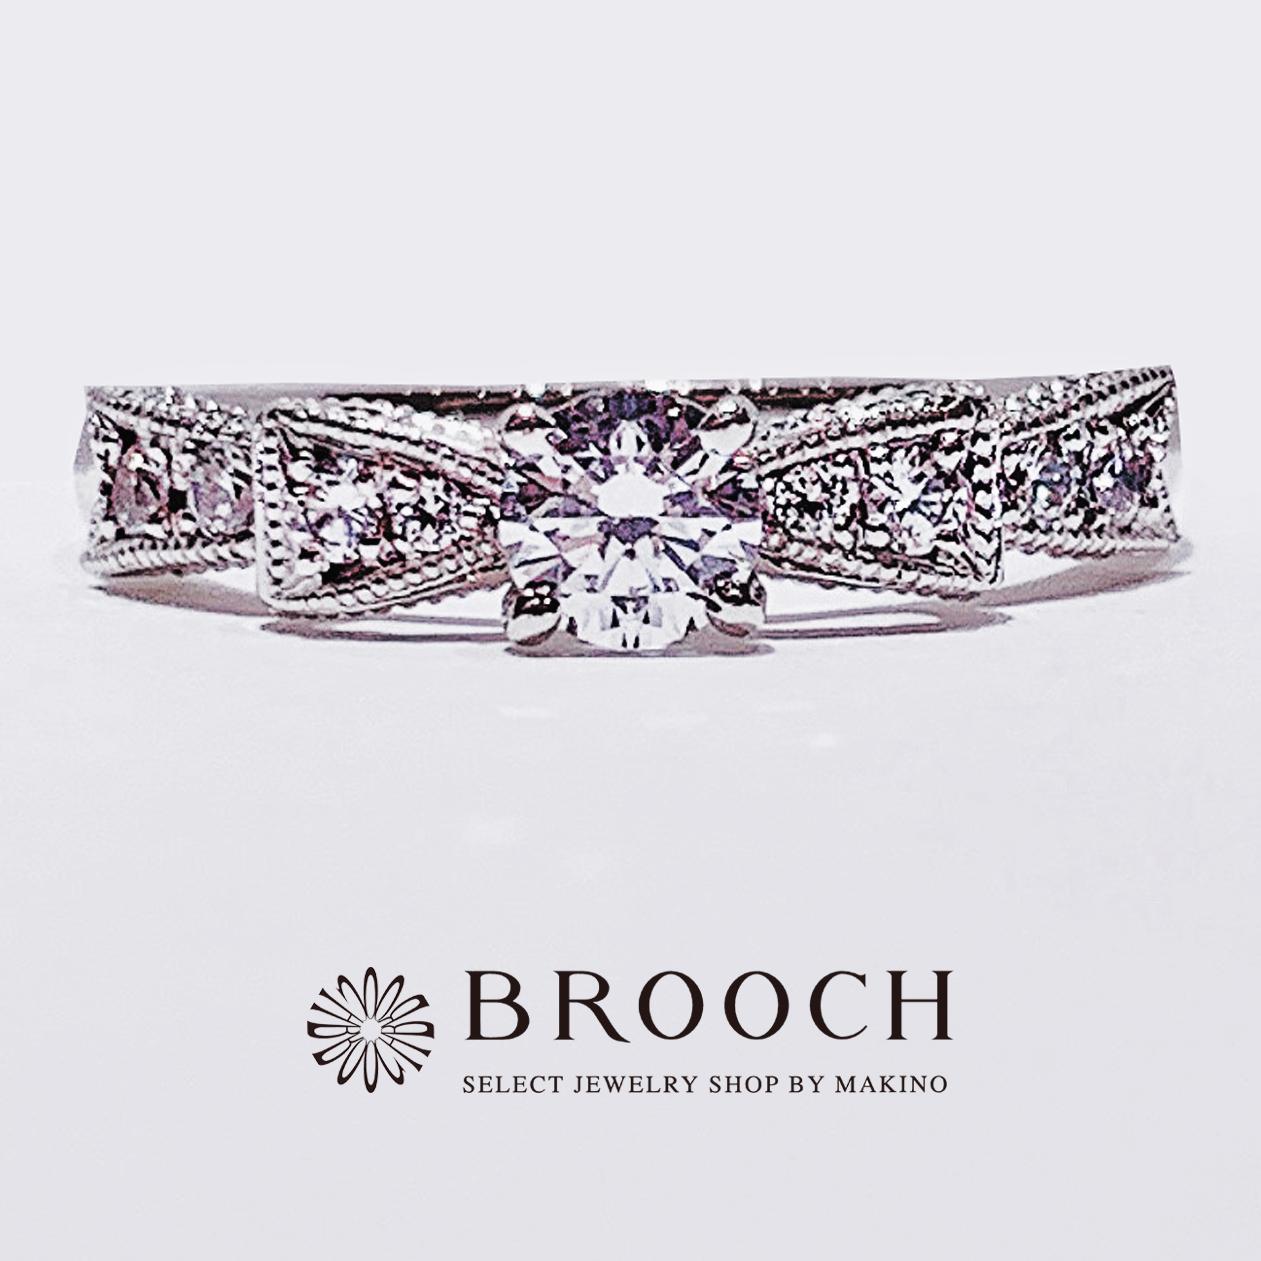 BROOCH 婚約指輪 エンゲージリング かわいい リボン型デザイン